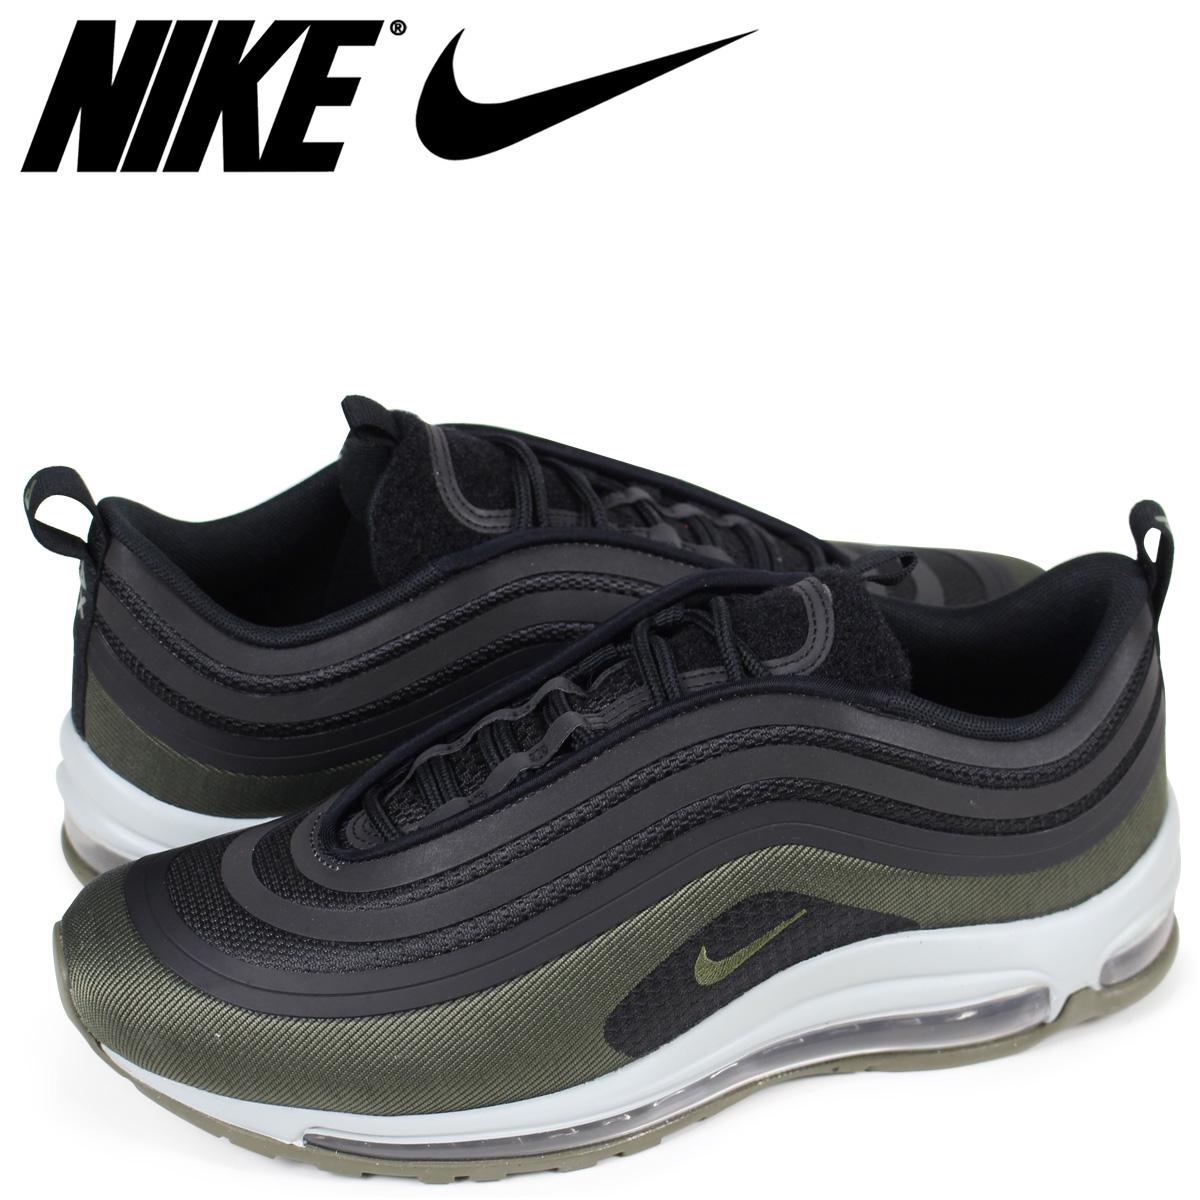 NIKE AIR MAX 97 UL 17 HAL HOT AIR PACK Kie Ney AMAX 97 sneakers men AH9945 001 black